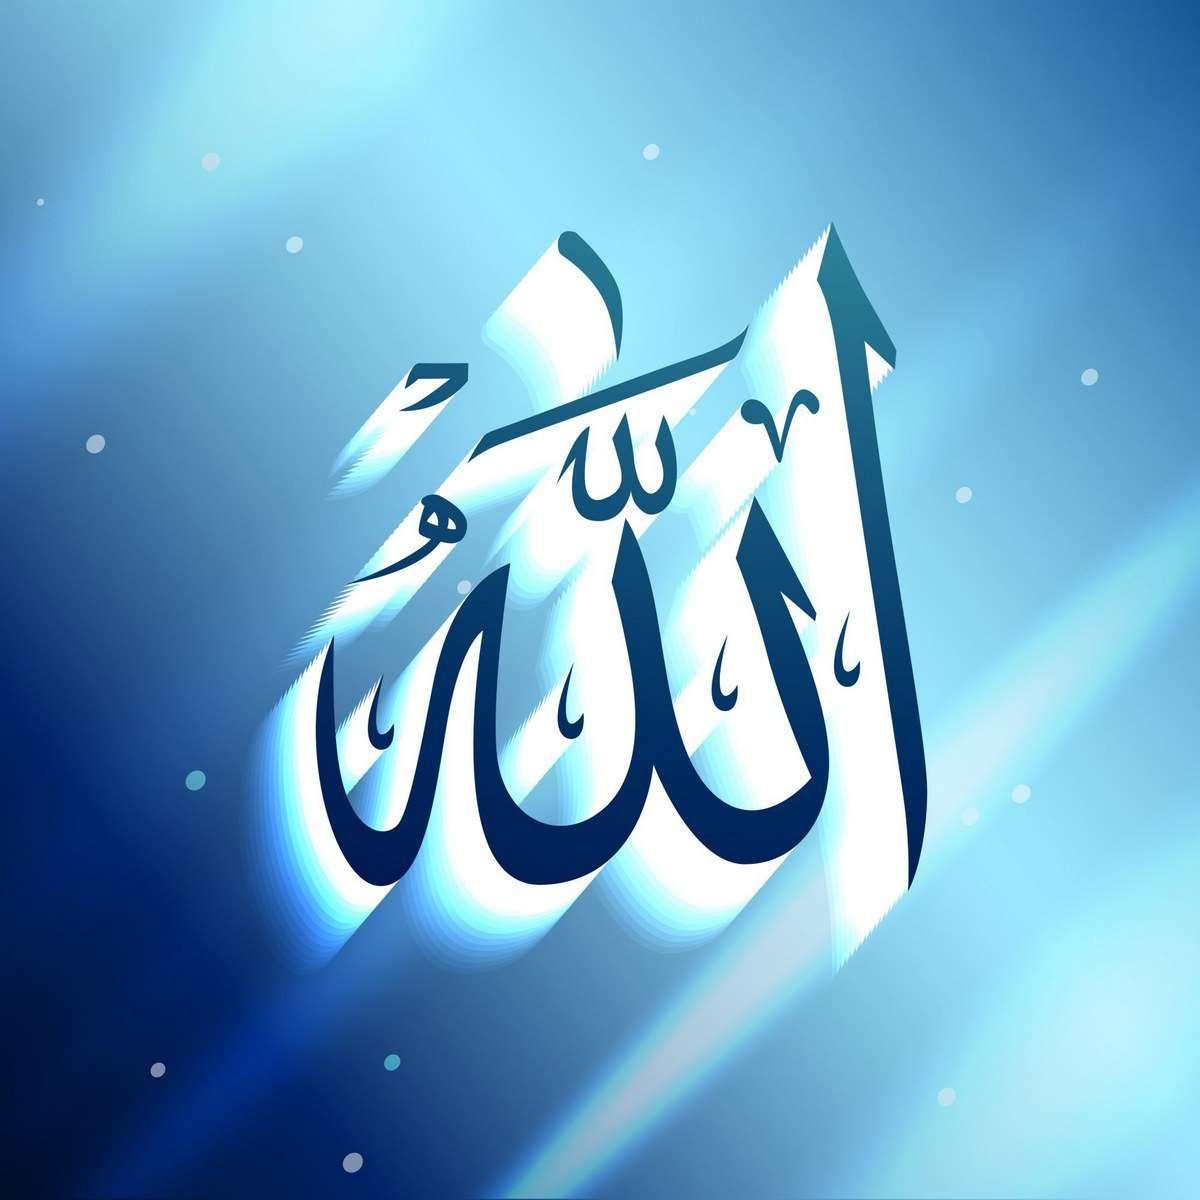 islam Allah background